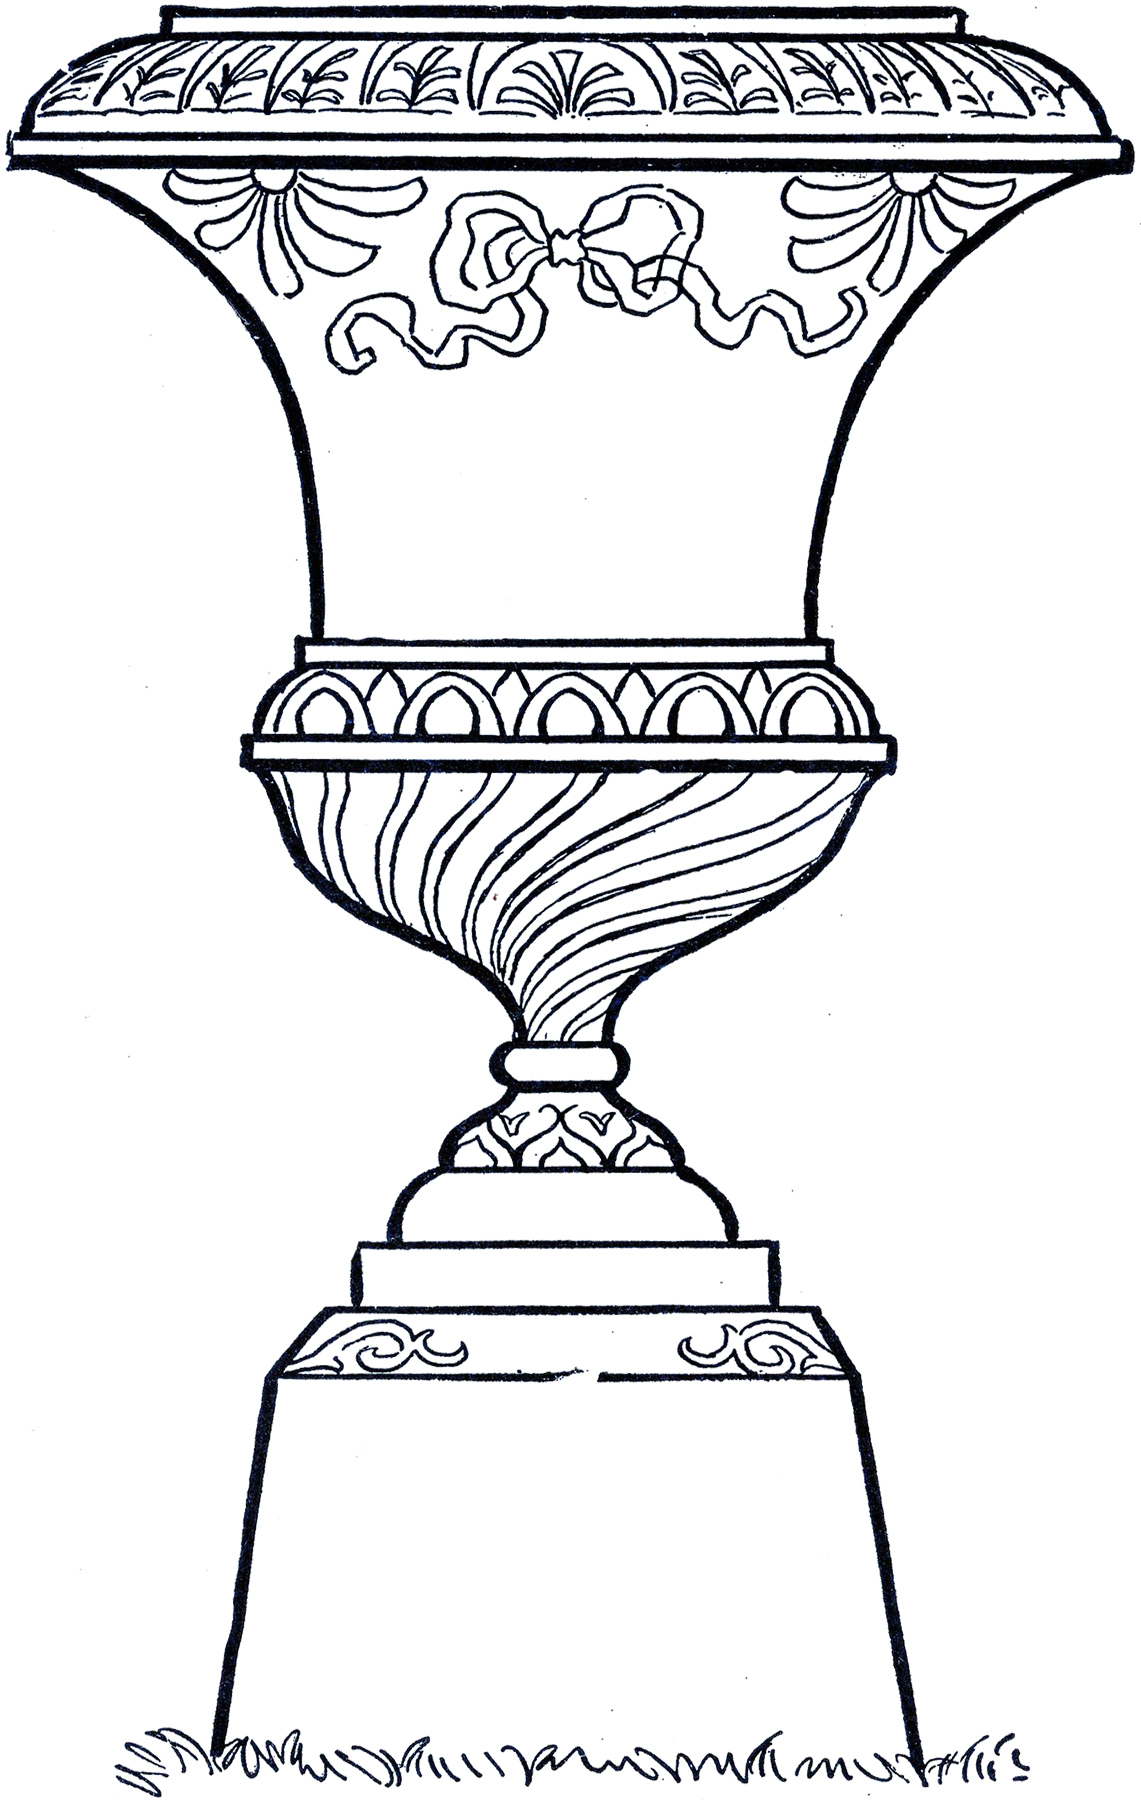 Line Drawing Garden : Vintage line art garden urn the graphics fairy